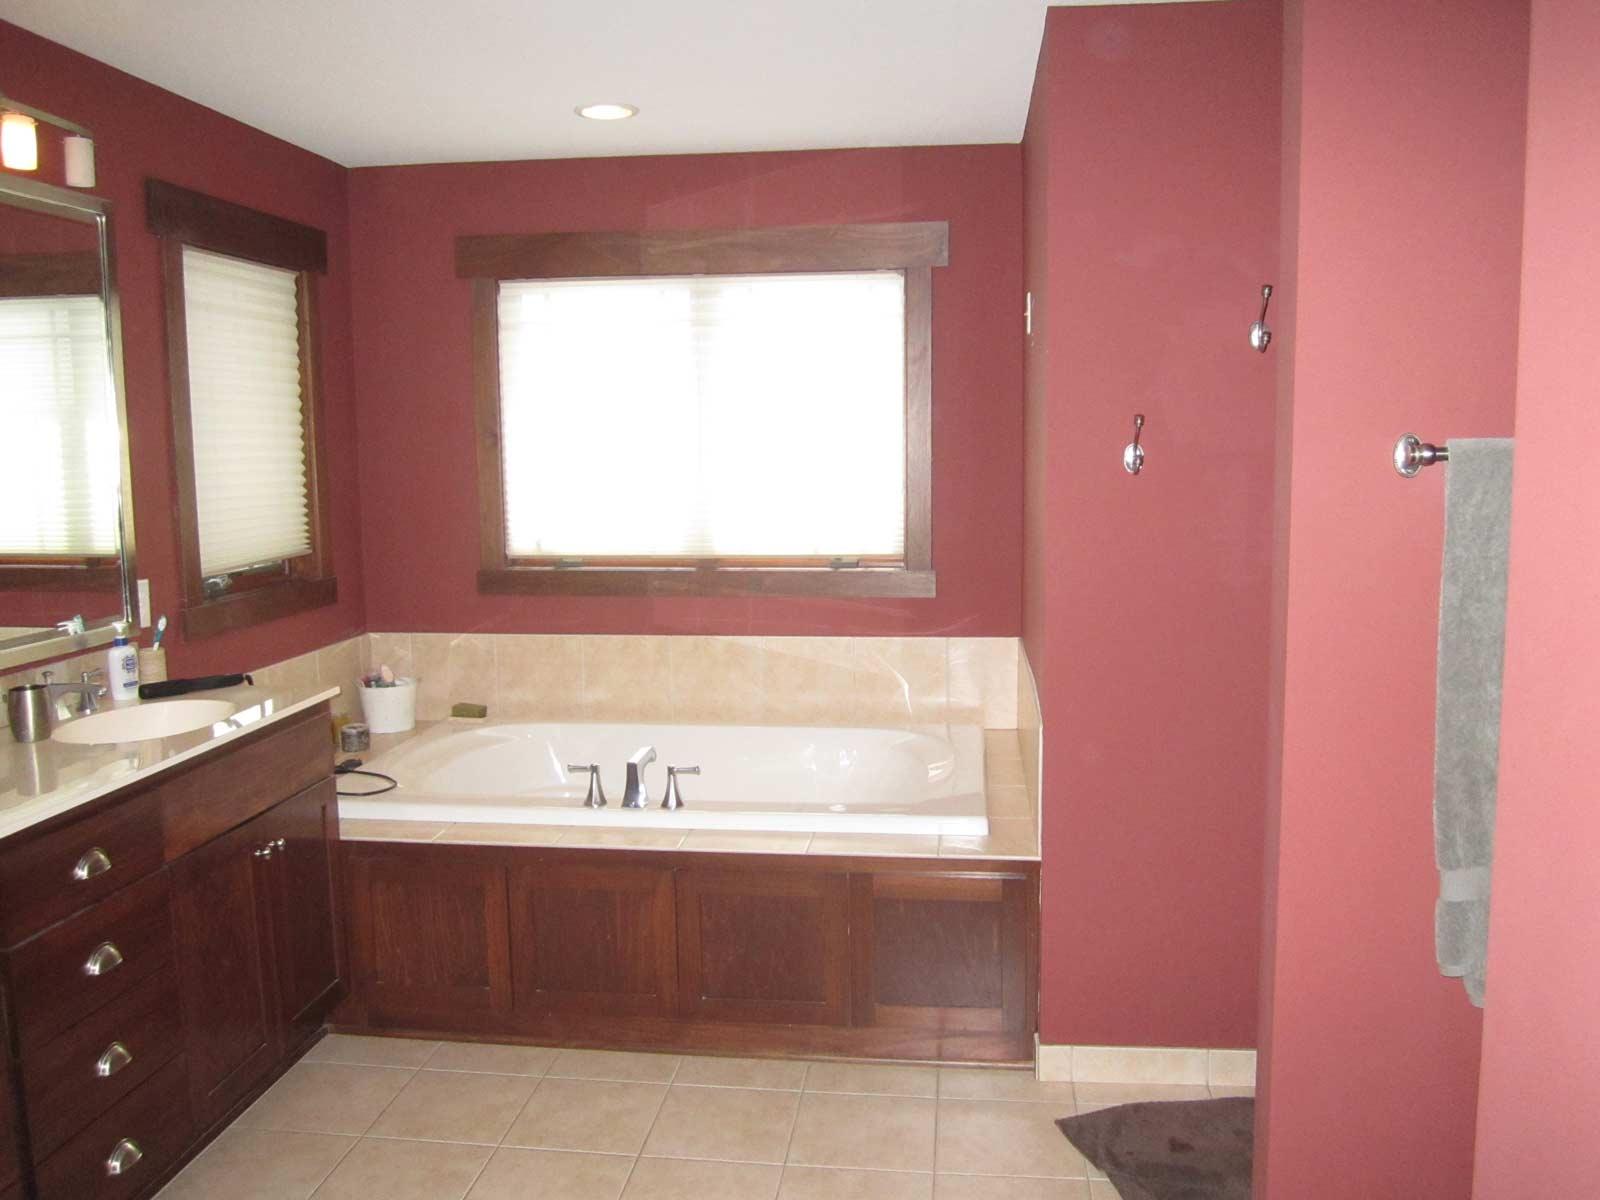 Bathroom Remodel Minneapolis Charming Bathroom Remodeling - Bathroom remodel mn